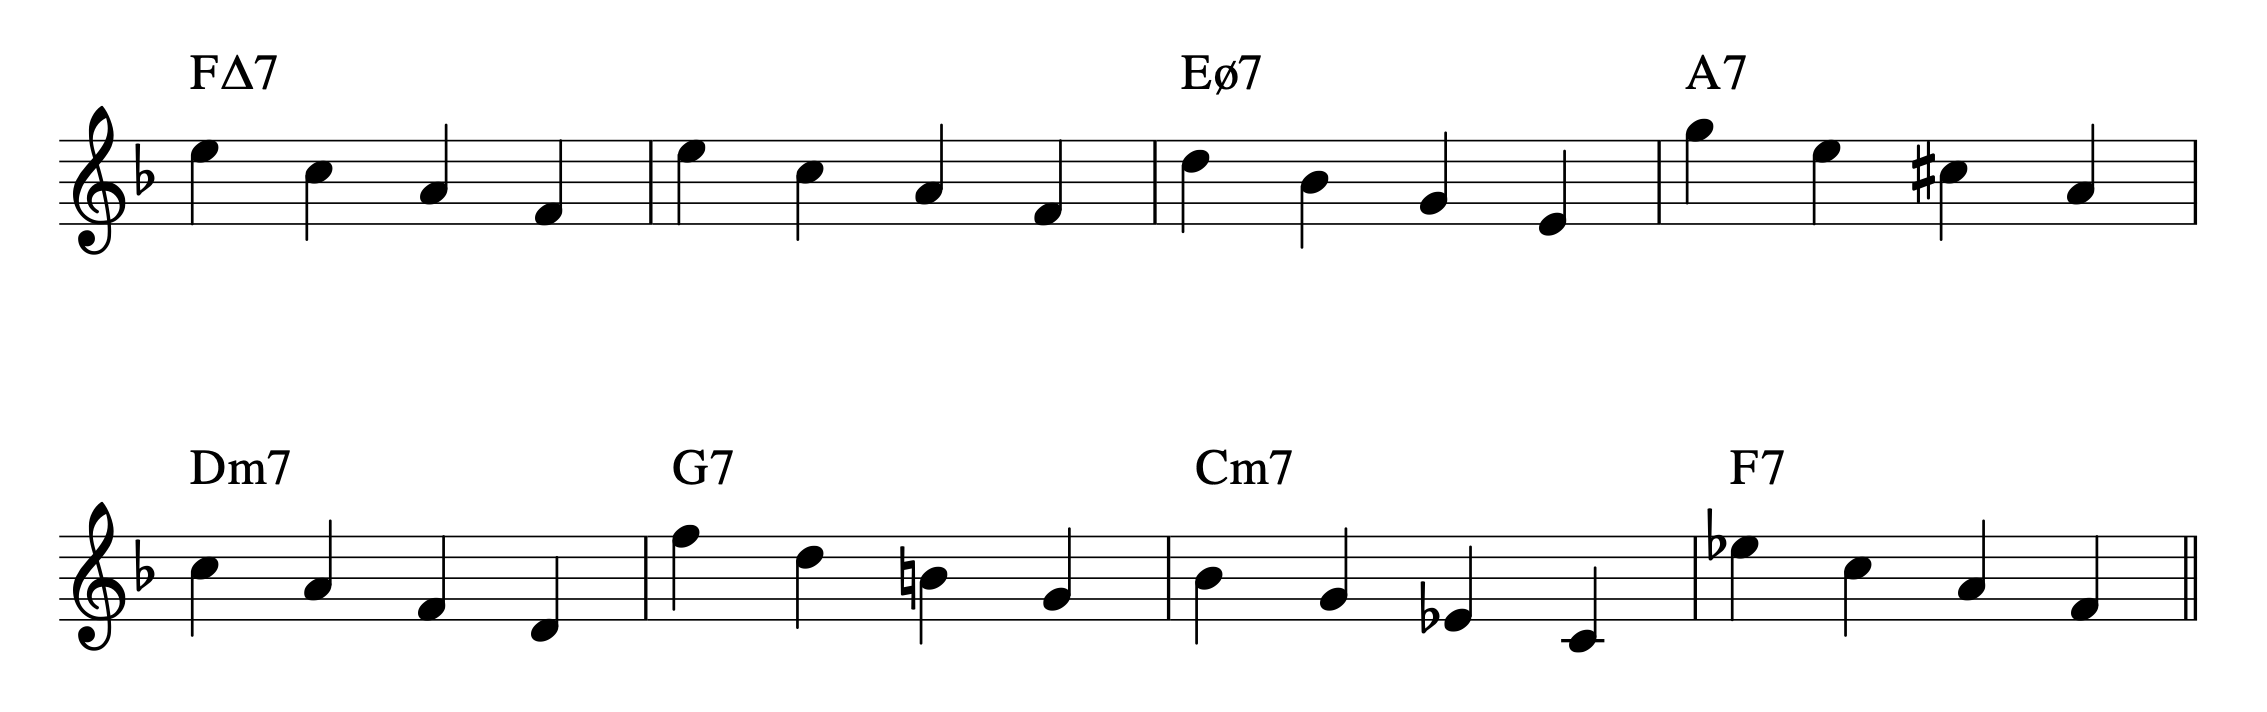 chords-tone-3